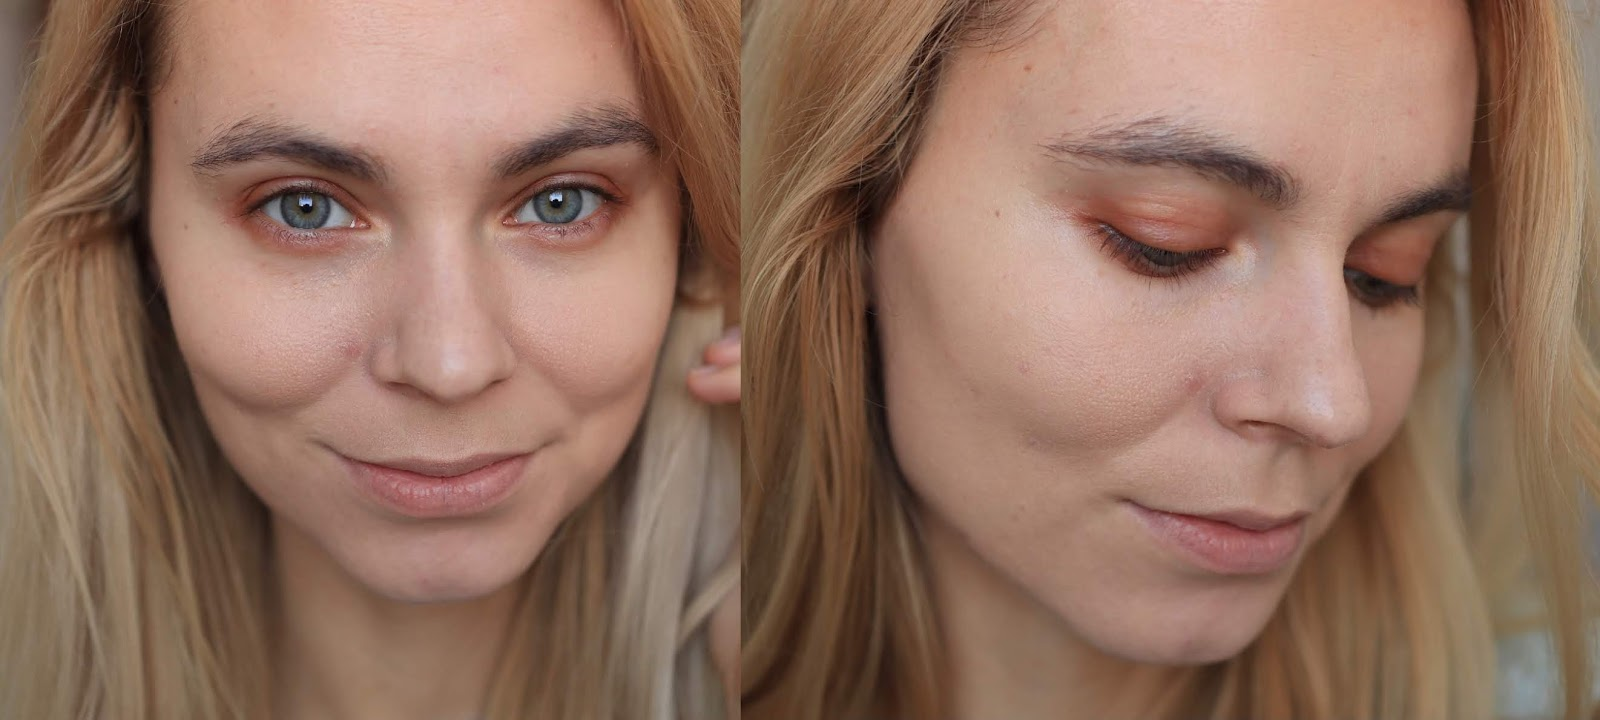 2nd skin 100 percent pure make up